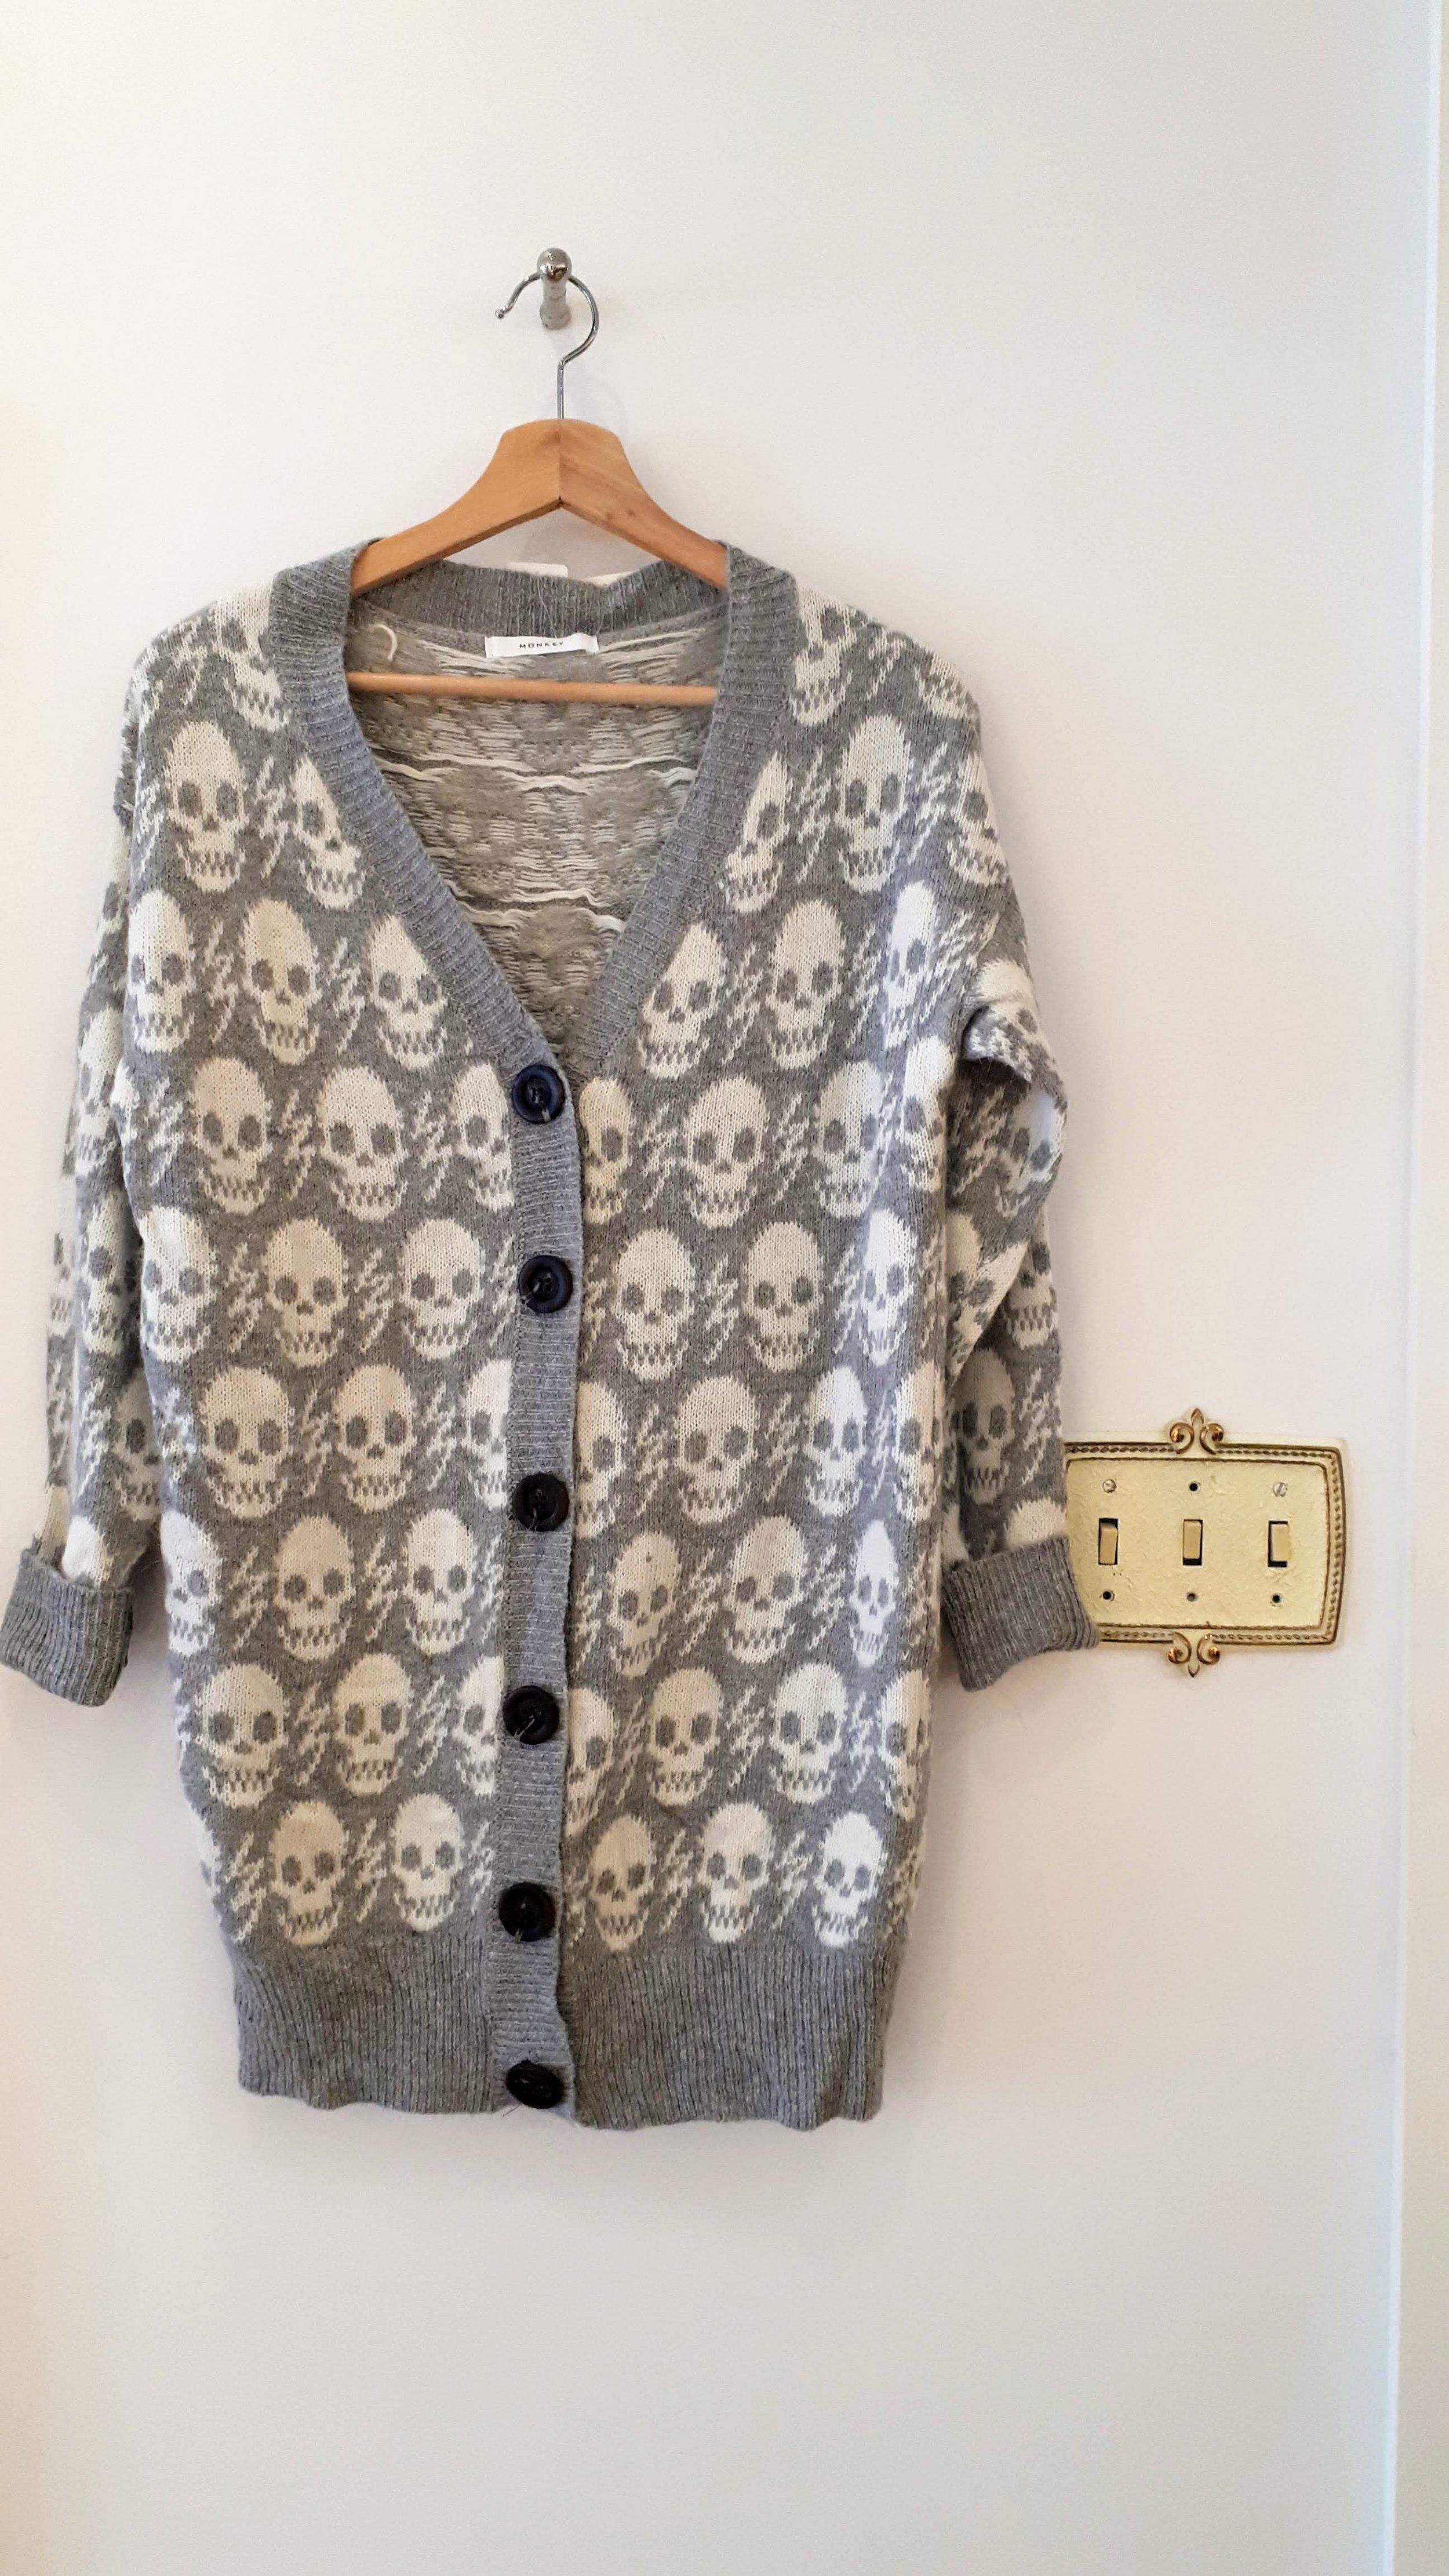 Monkey sweater (NWT); Size M, $30